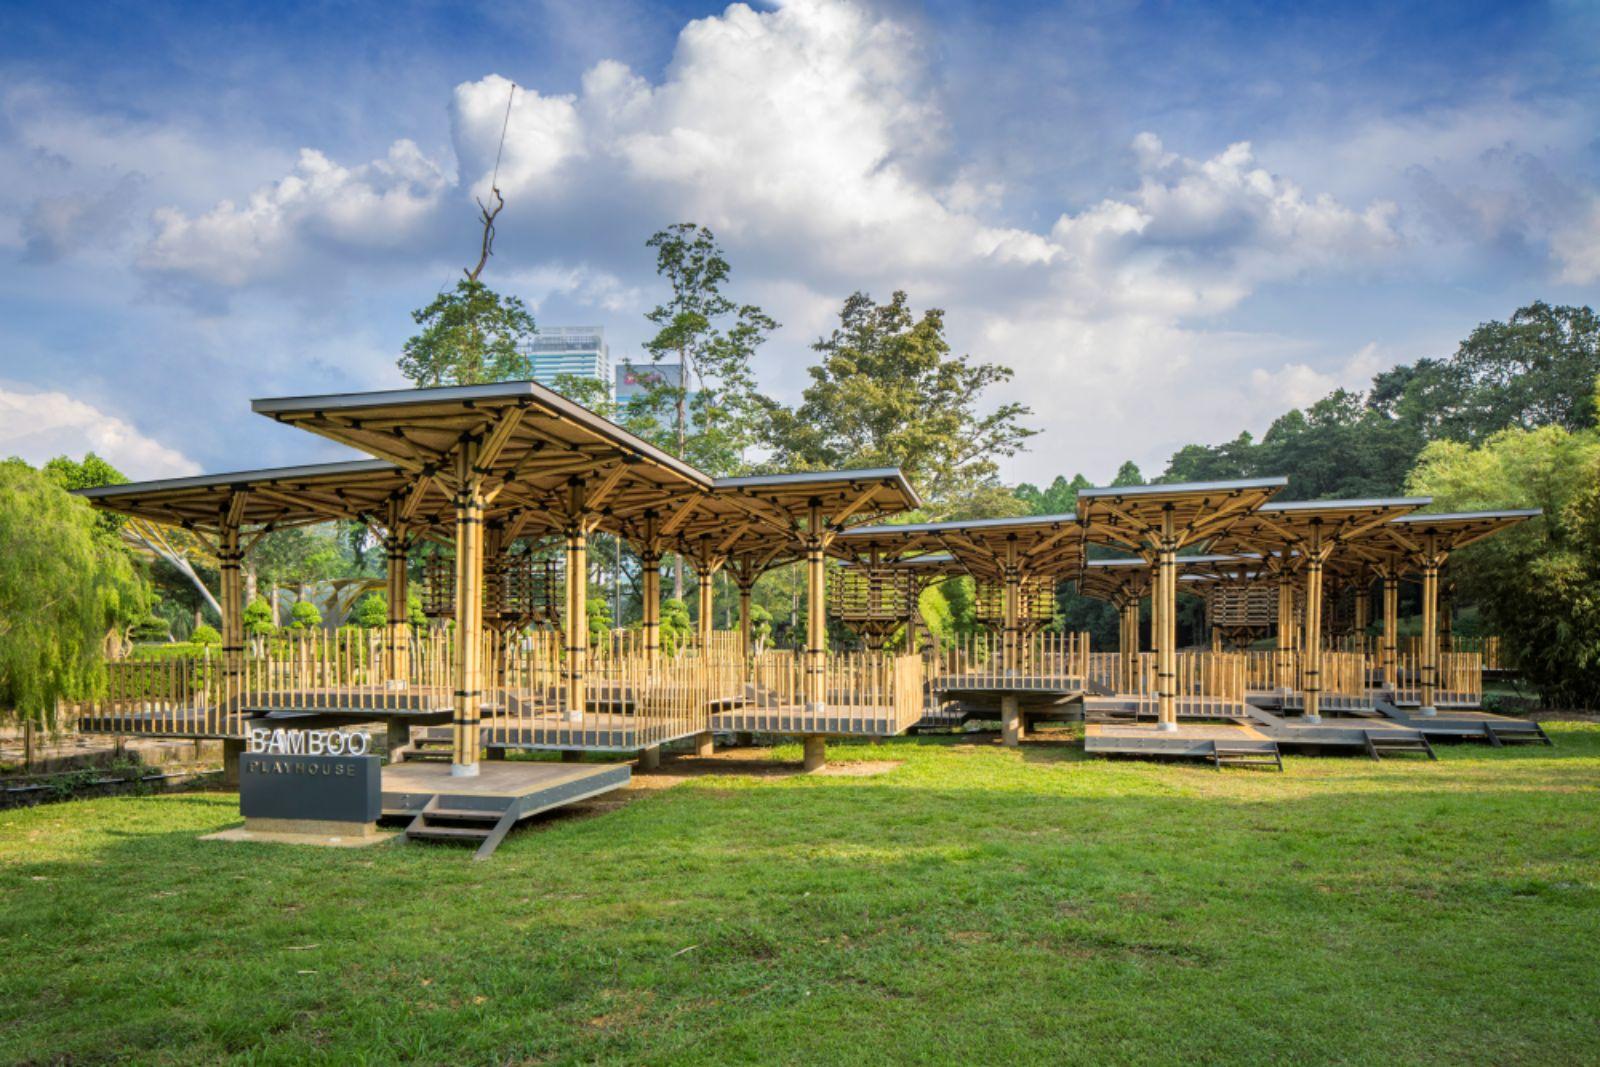 The Bamboo Playhouse